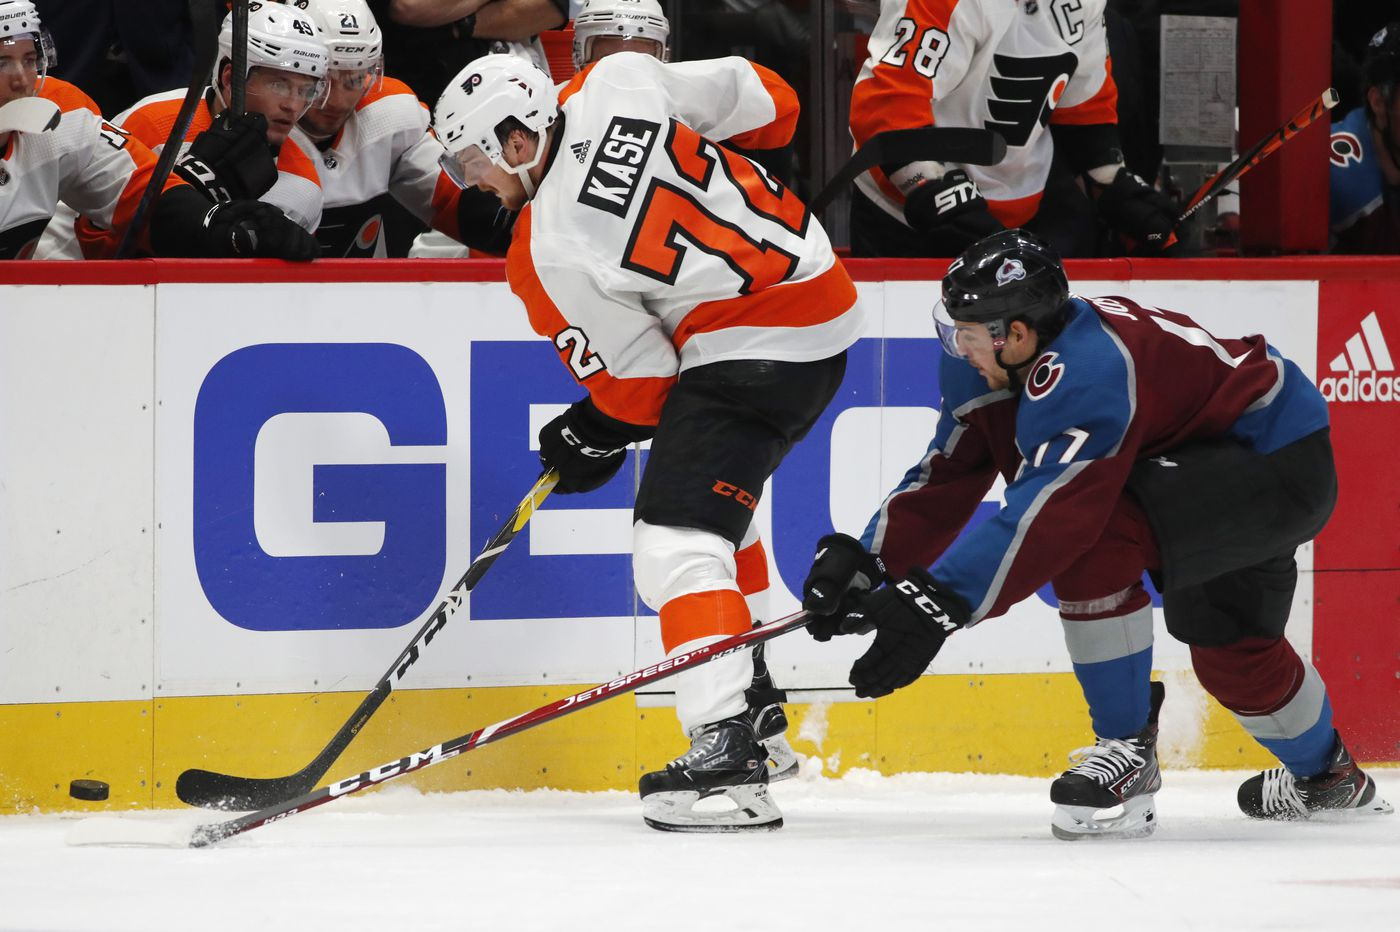 Flyers winger David Kase makes good showing in NHL debut against Avalanche